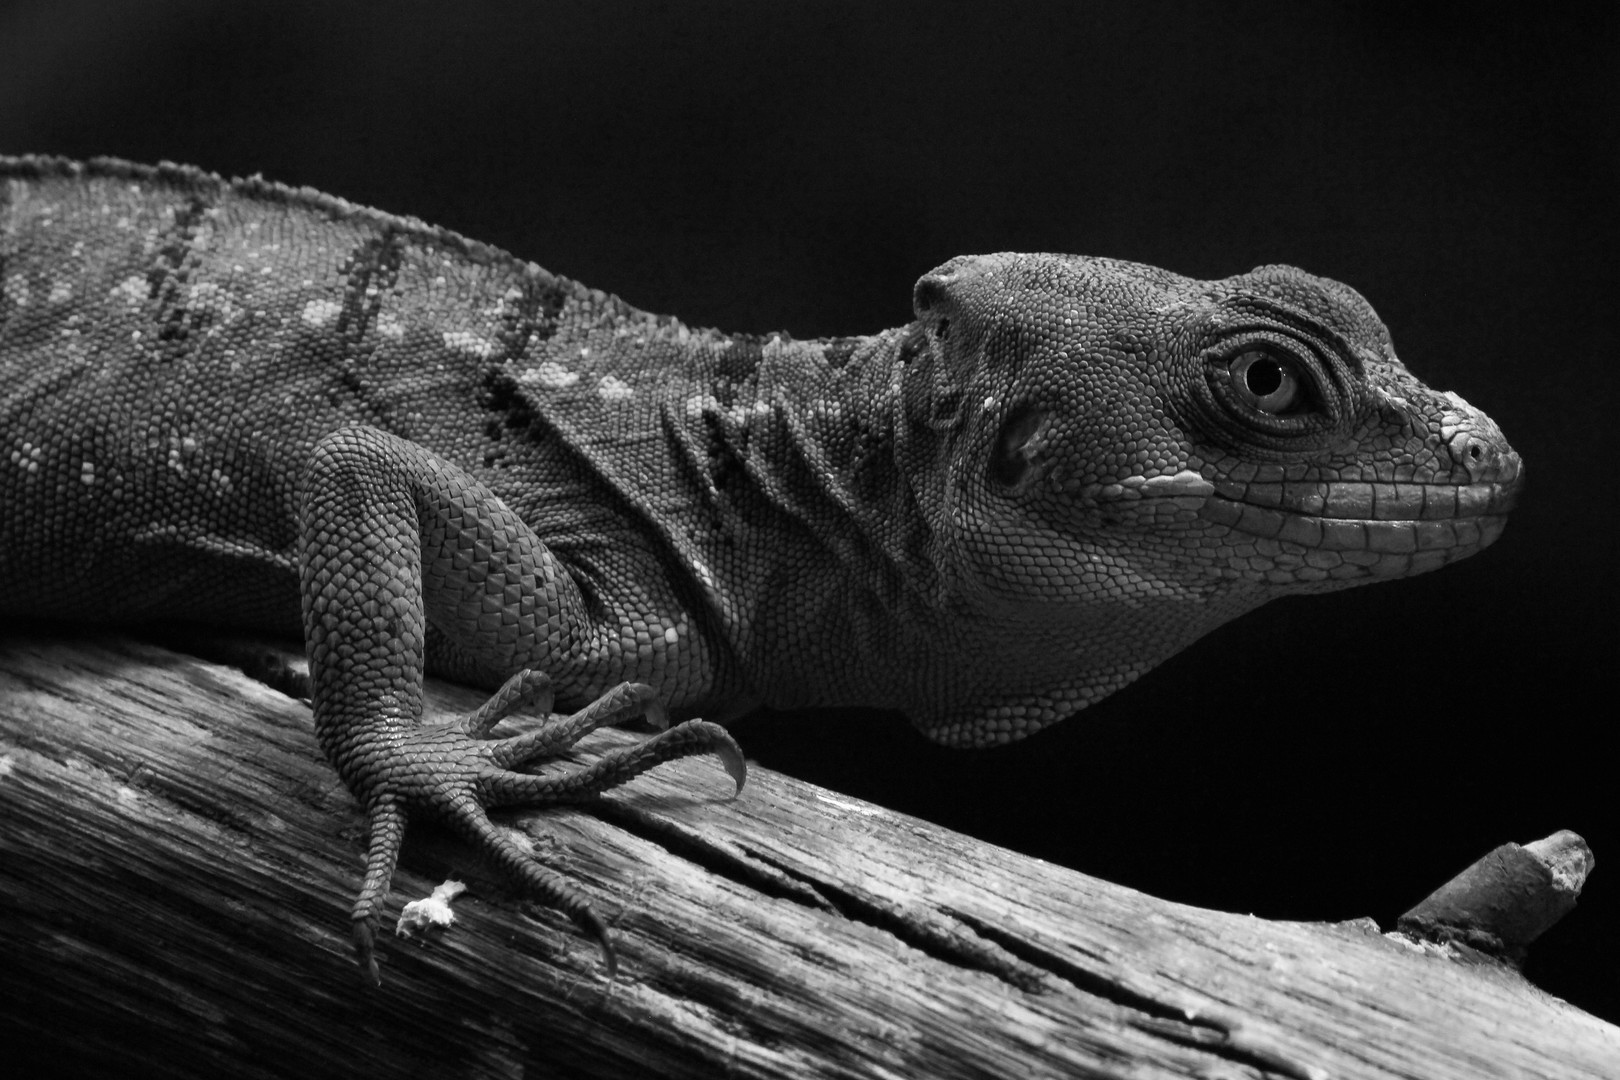 Johannes Wirl, Gecko